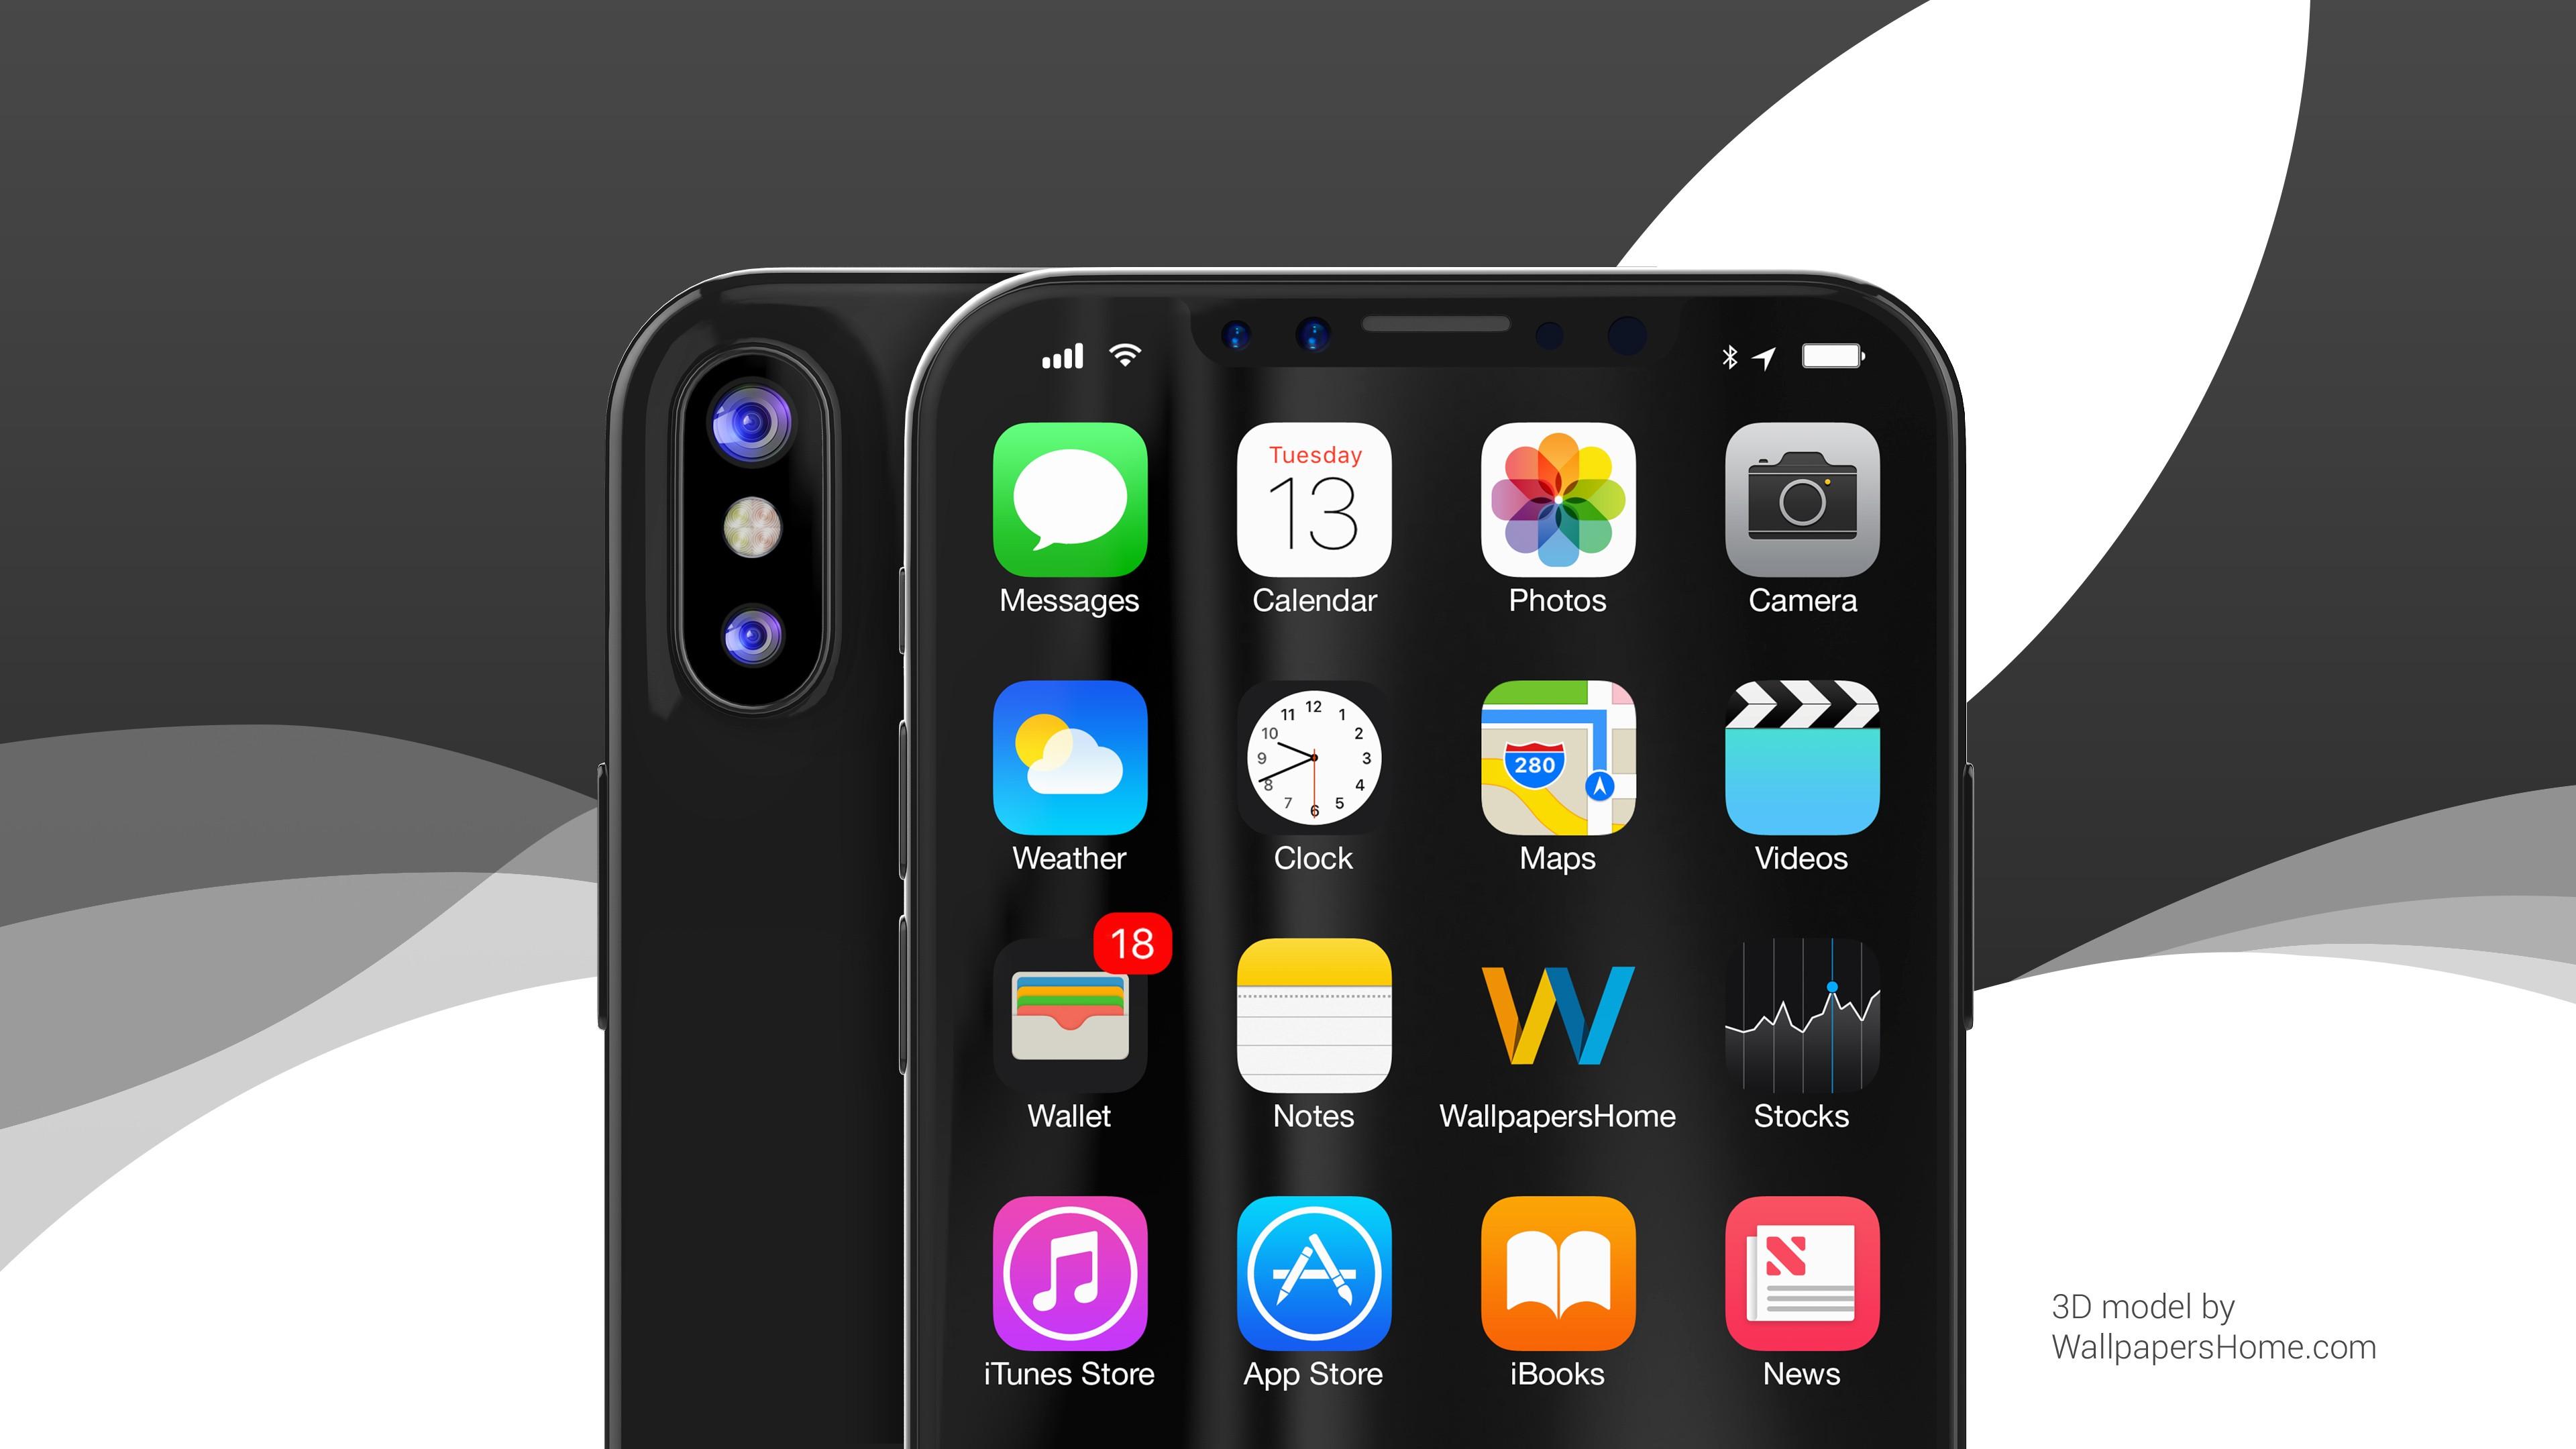 Iphone X Iphone 10 Hd Wallpapers: Обои Айфон X, IPhone X, Black, WWDC 2017, 4k, Хай-тек #15652